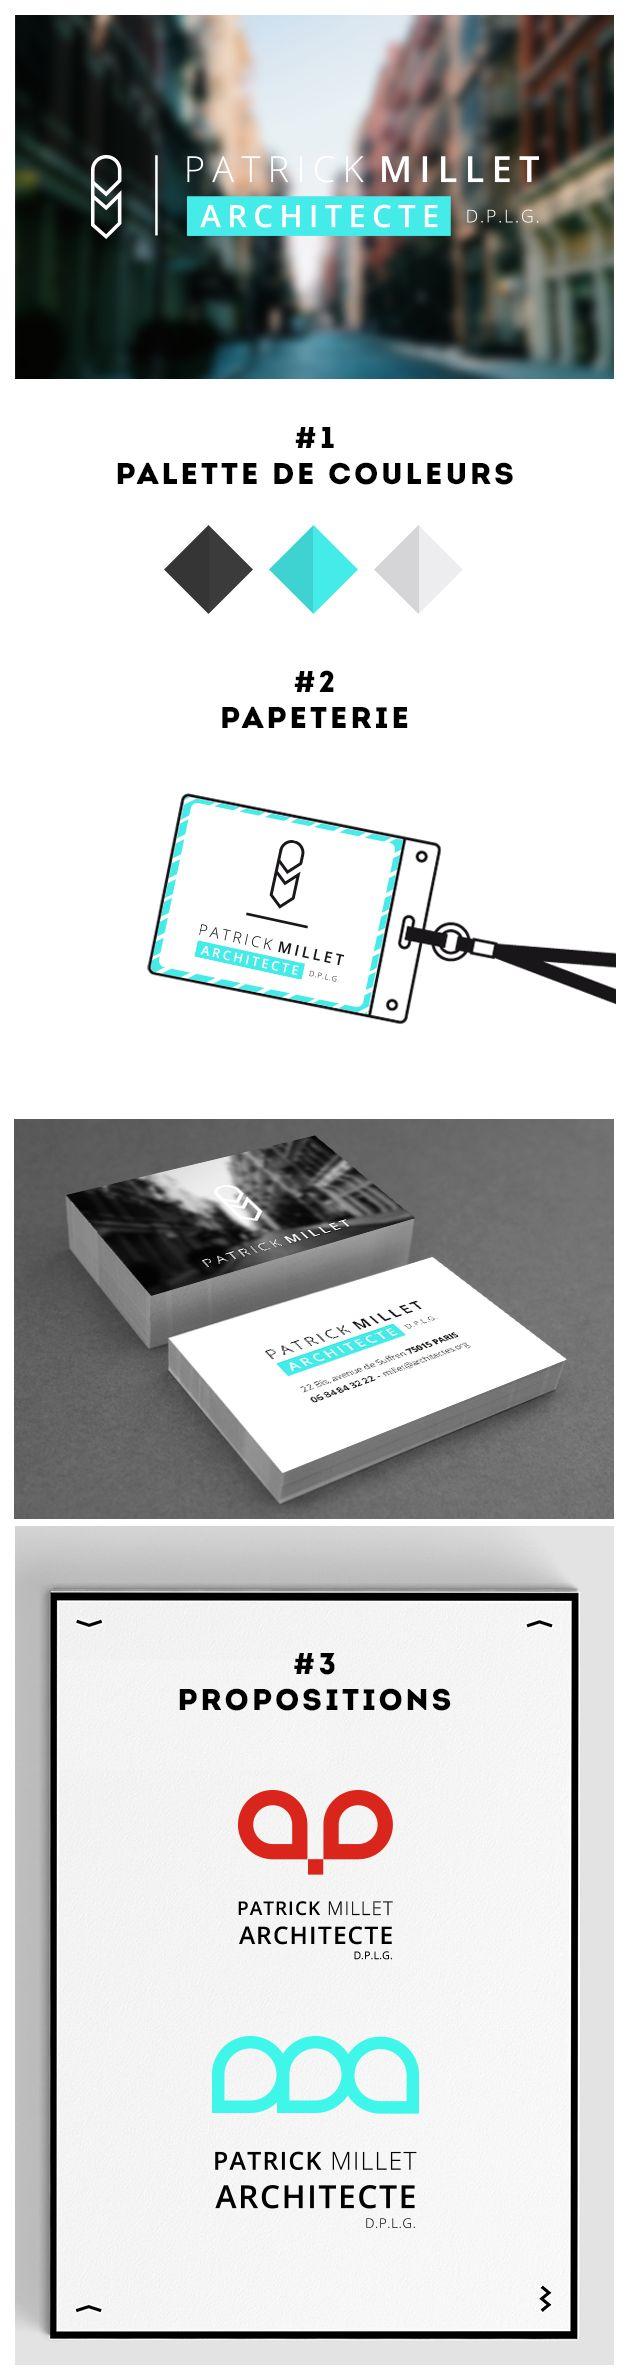 patrick millet #architecte #identite #visuelle #logo #graphisme #graphic #design #logotype